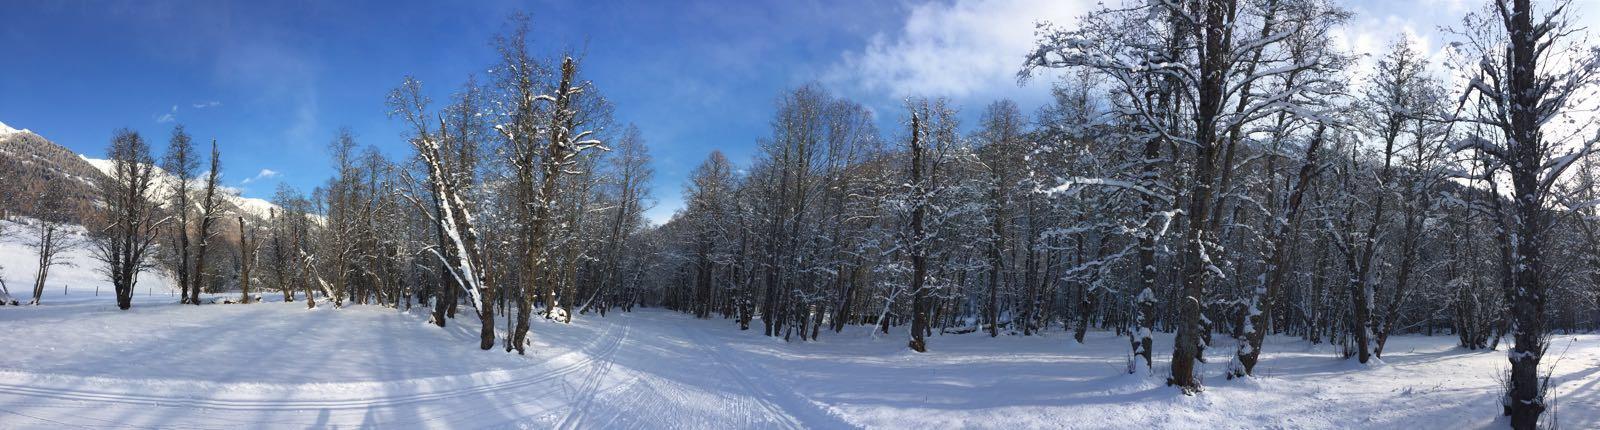 Langlauf-Weekend Goms 1./2. Dezember 2018